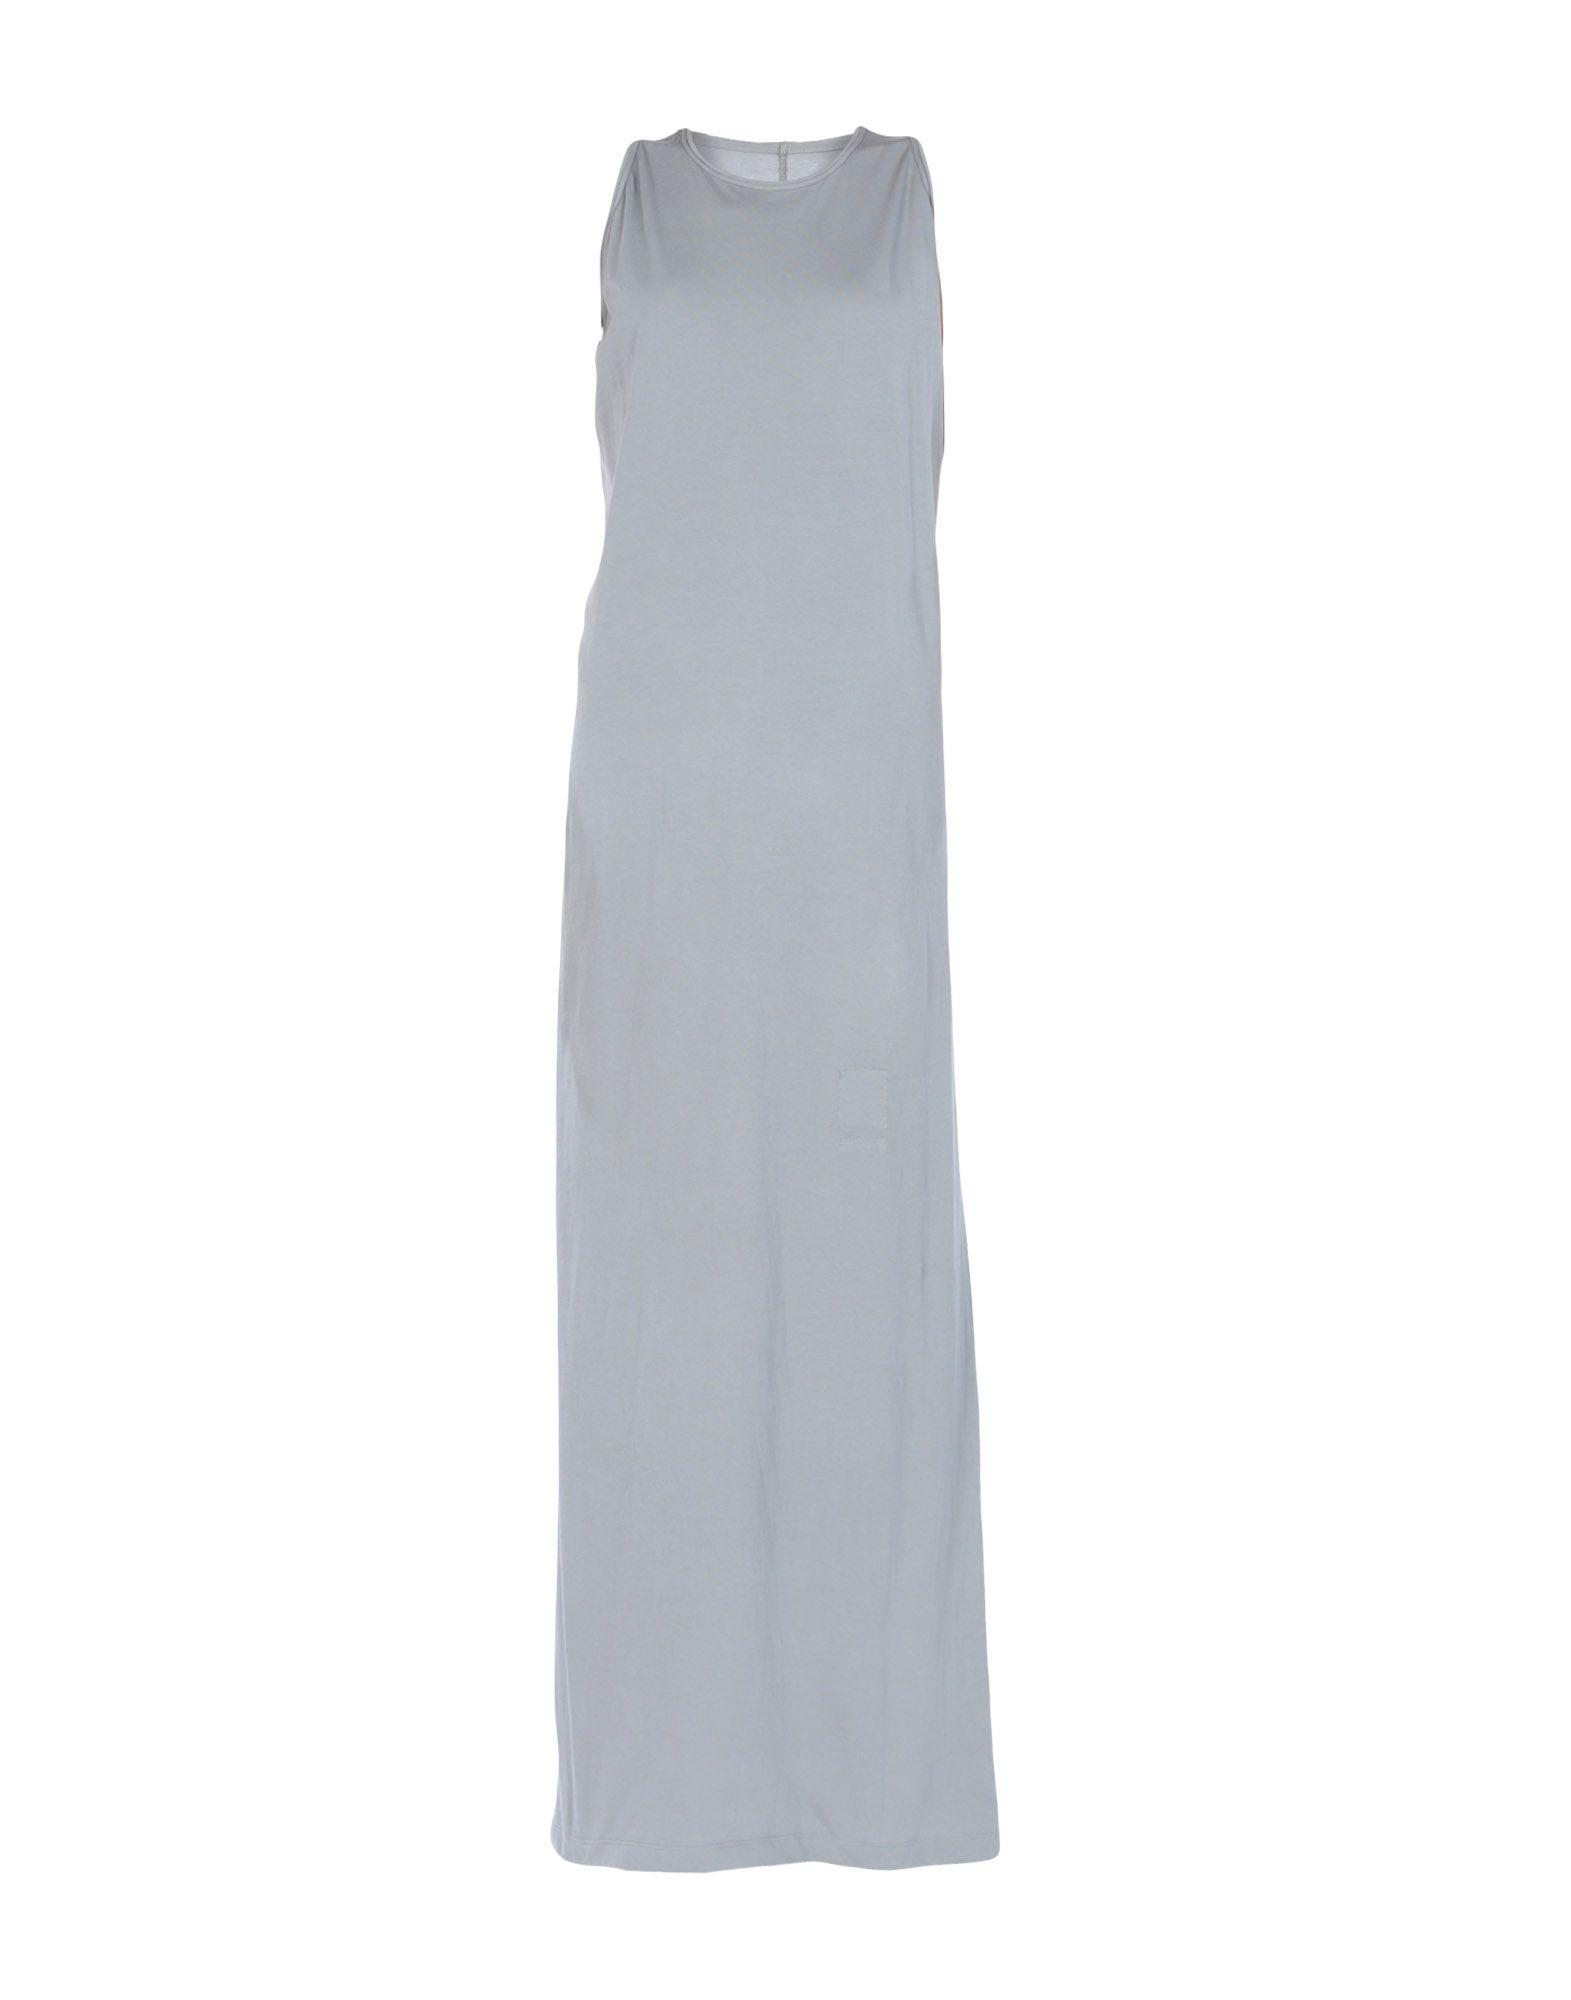 DRKSHDW by RICK OWENS Длинное платье блузка quelle rick cardona by heine 4025